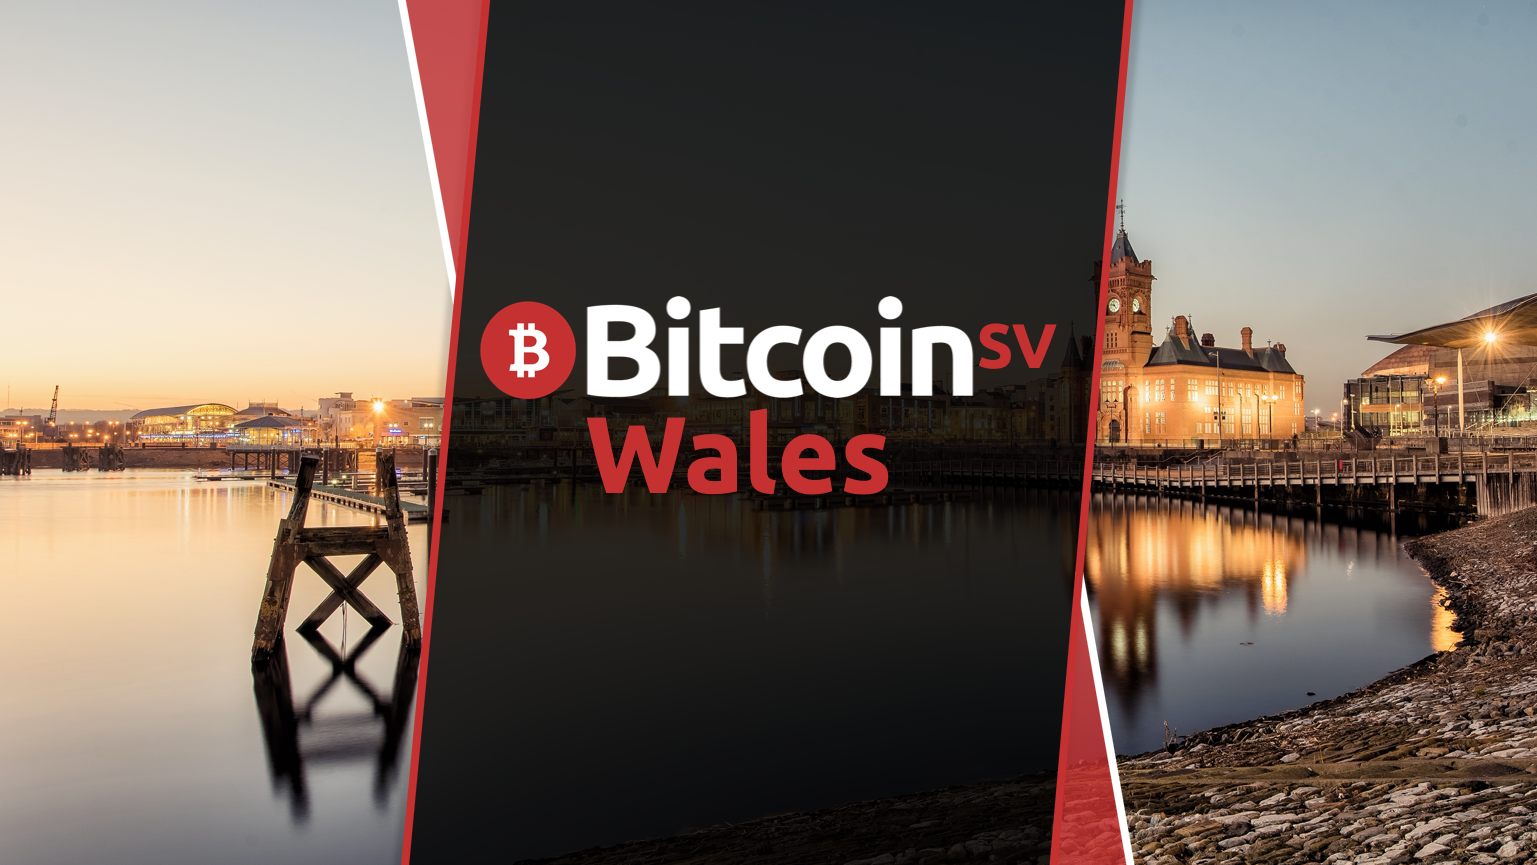 Bitcoin SV Wales